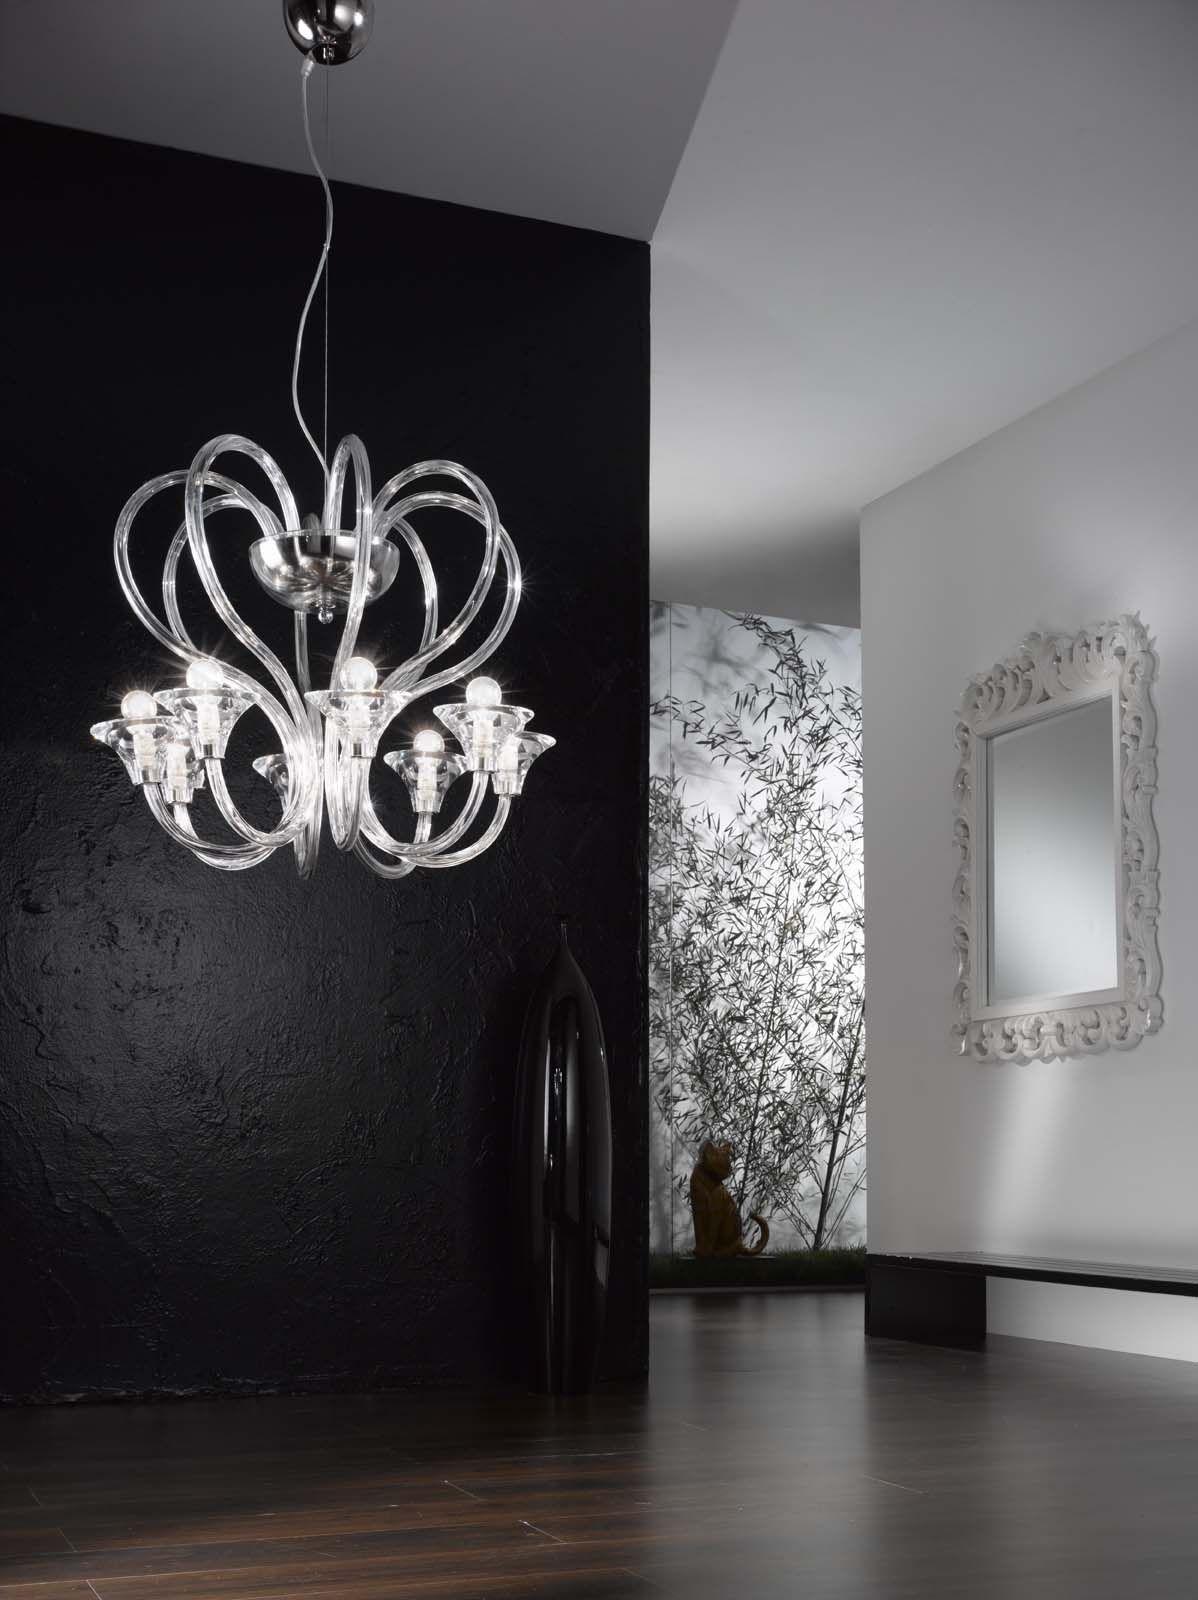 Swan Princess, simply stunning Contact KES Lighting for more information #lighting #home #designer #luxury #chandelier #swan #princess #elegant